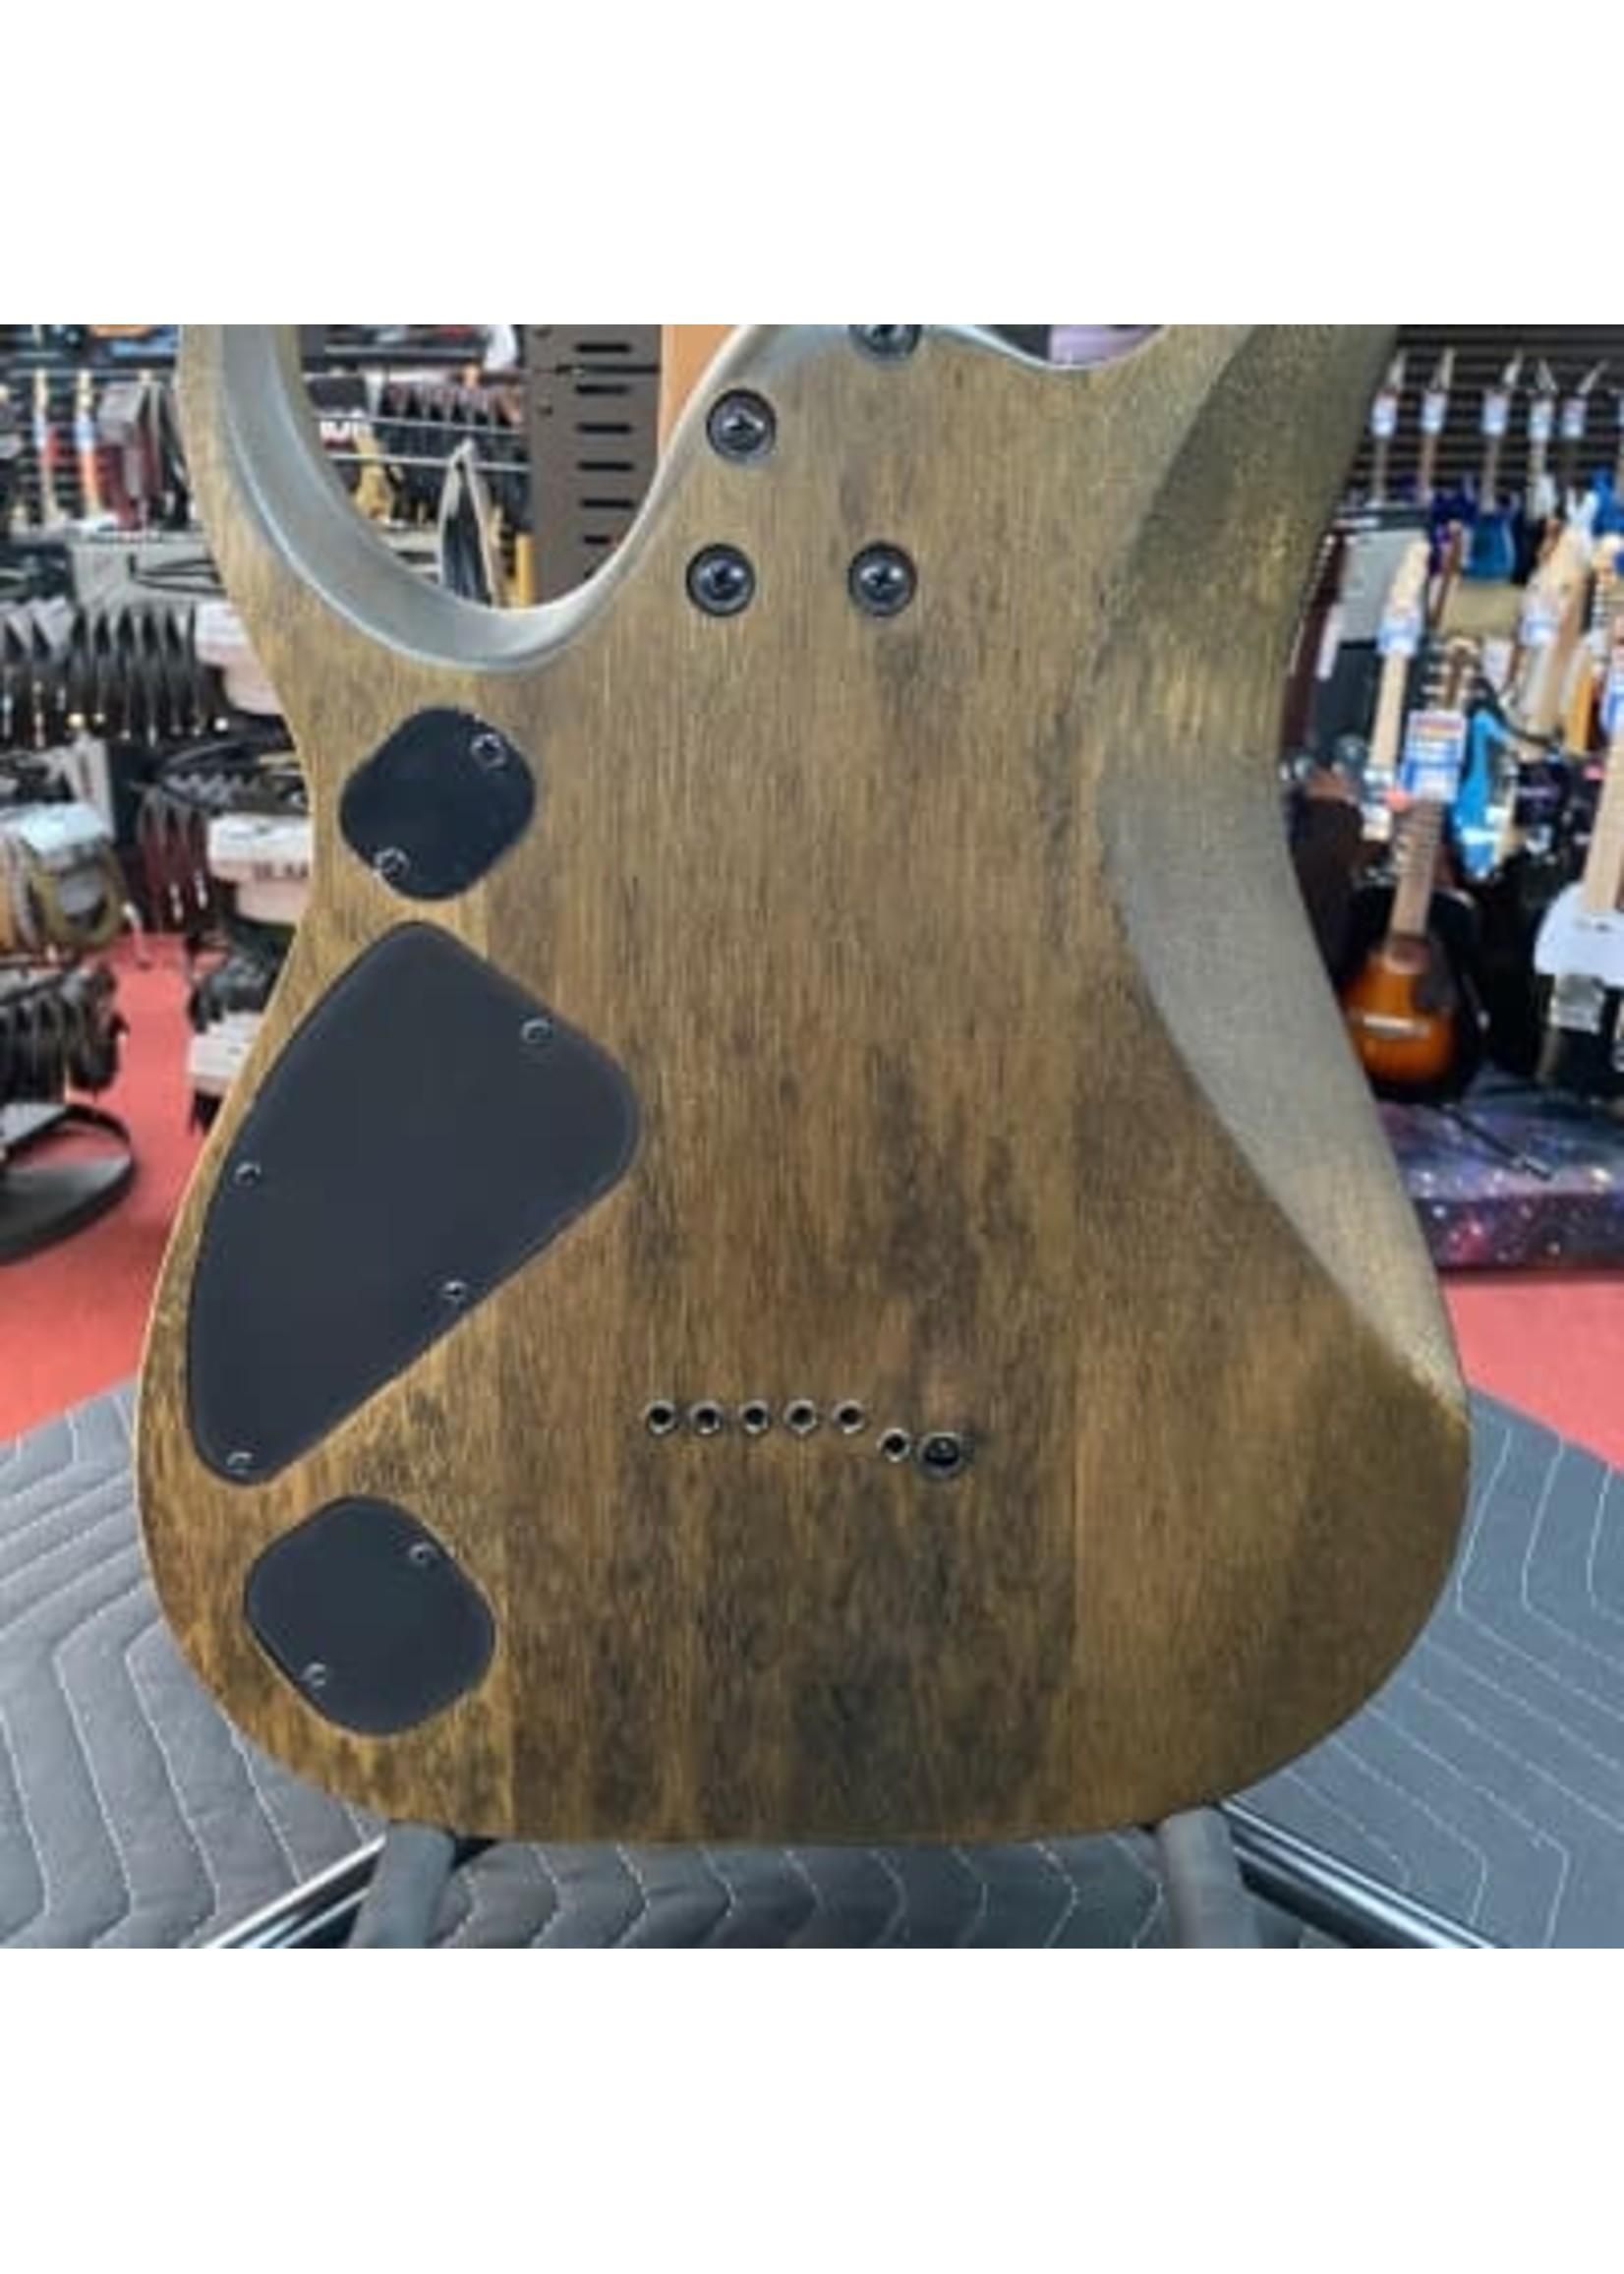 Ibanez Ibanez Standard RGD7521PB Electric Guitar - Deep Seafloor Fade Flat